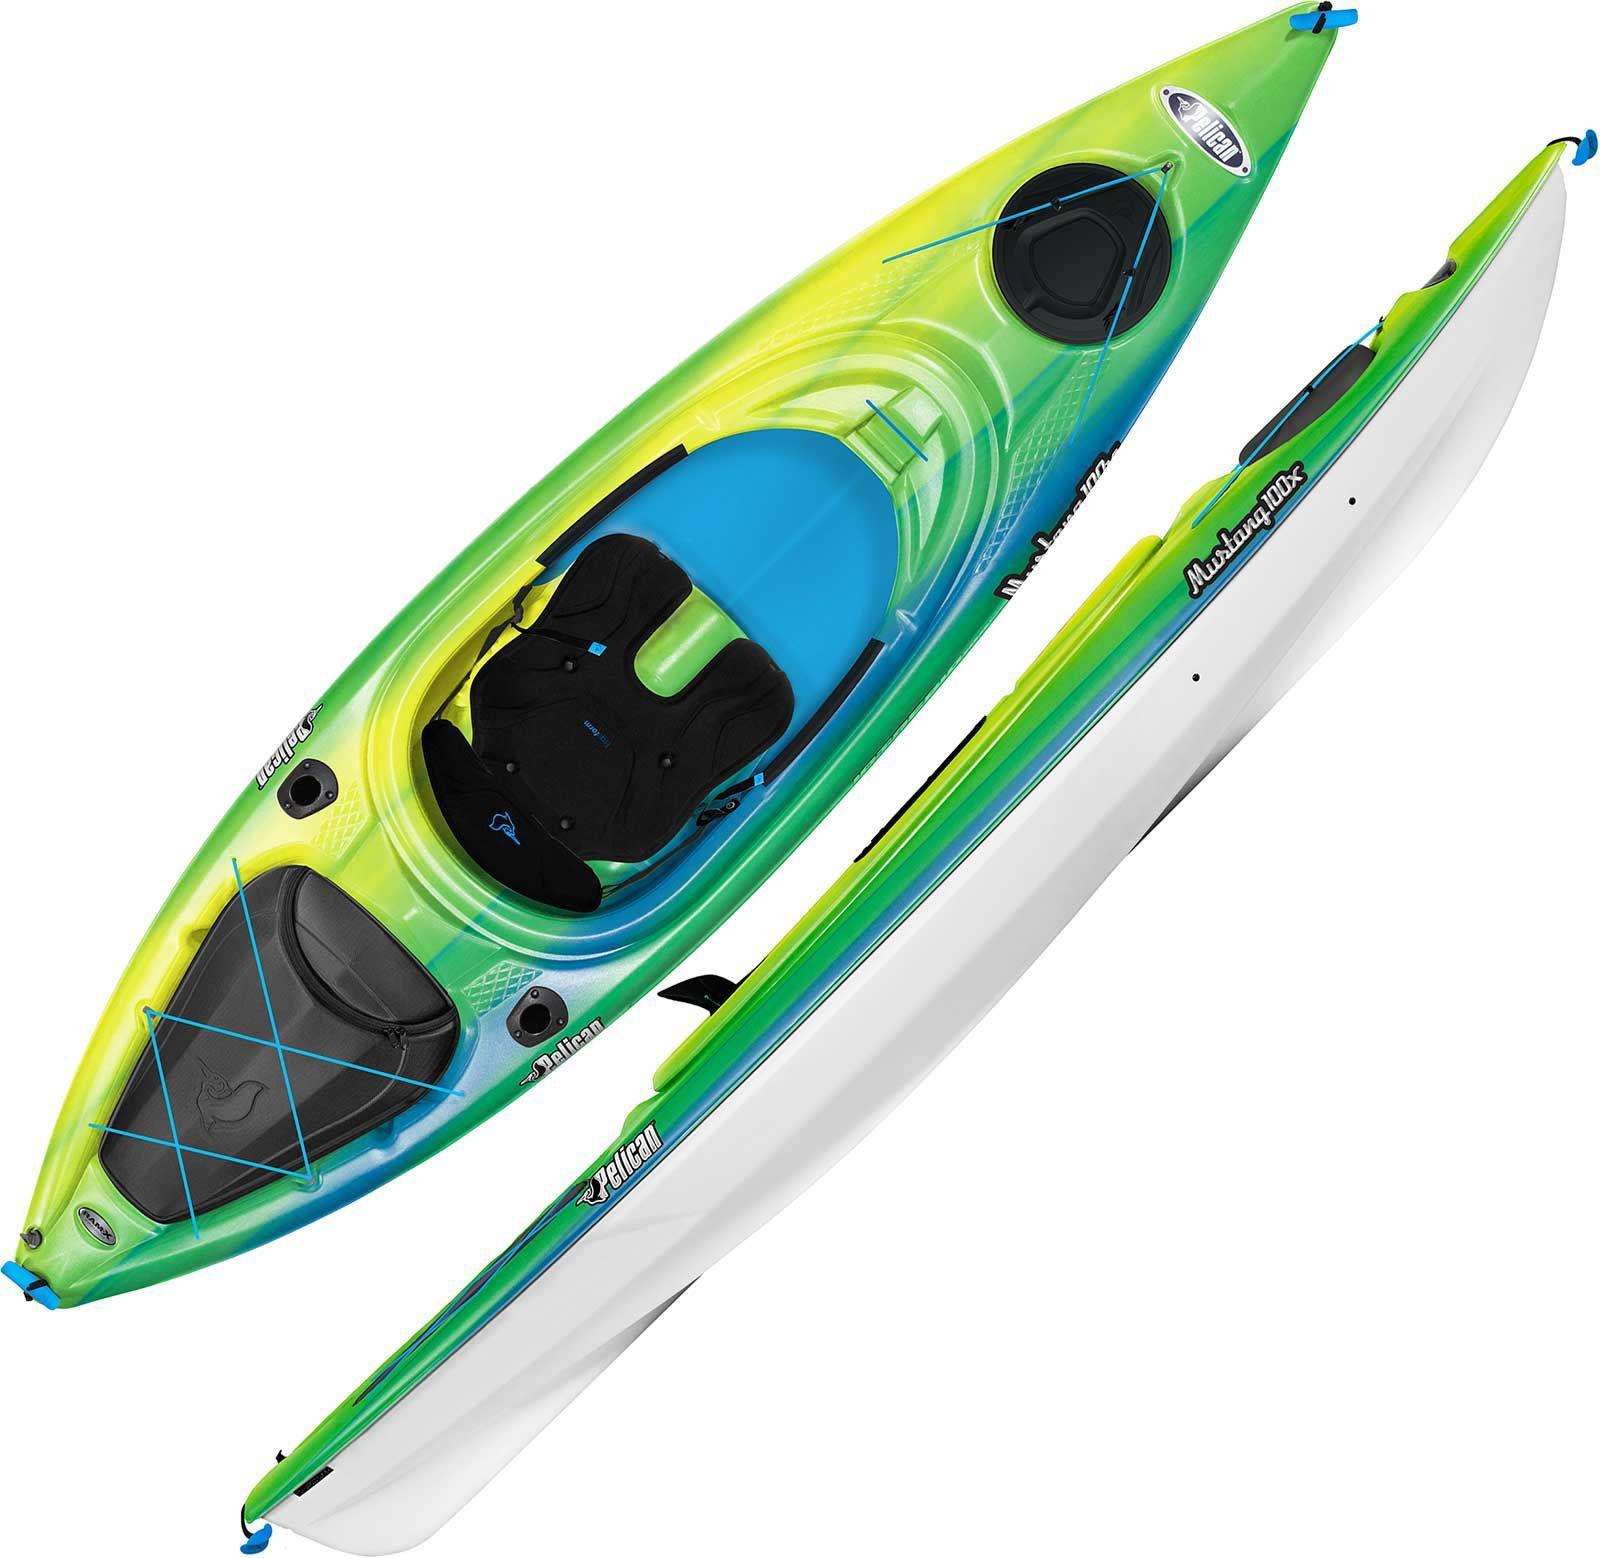 Pelican Mustang 100X Kayak | Everybody has Wants | Kayaking, Pelican